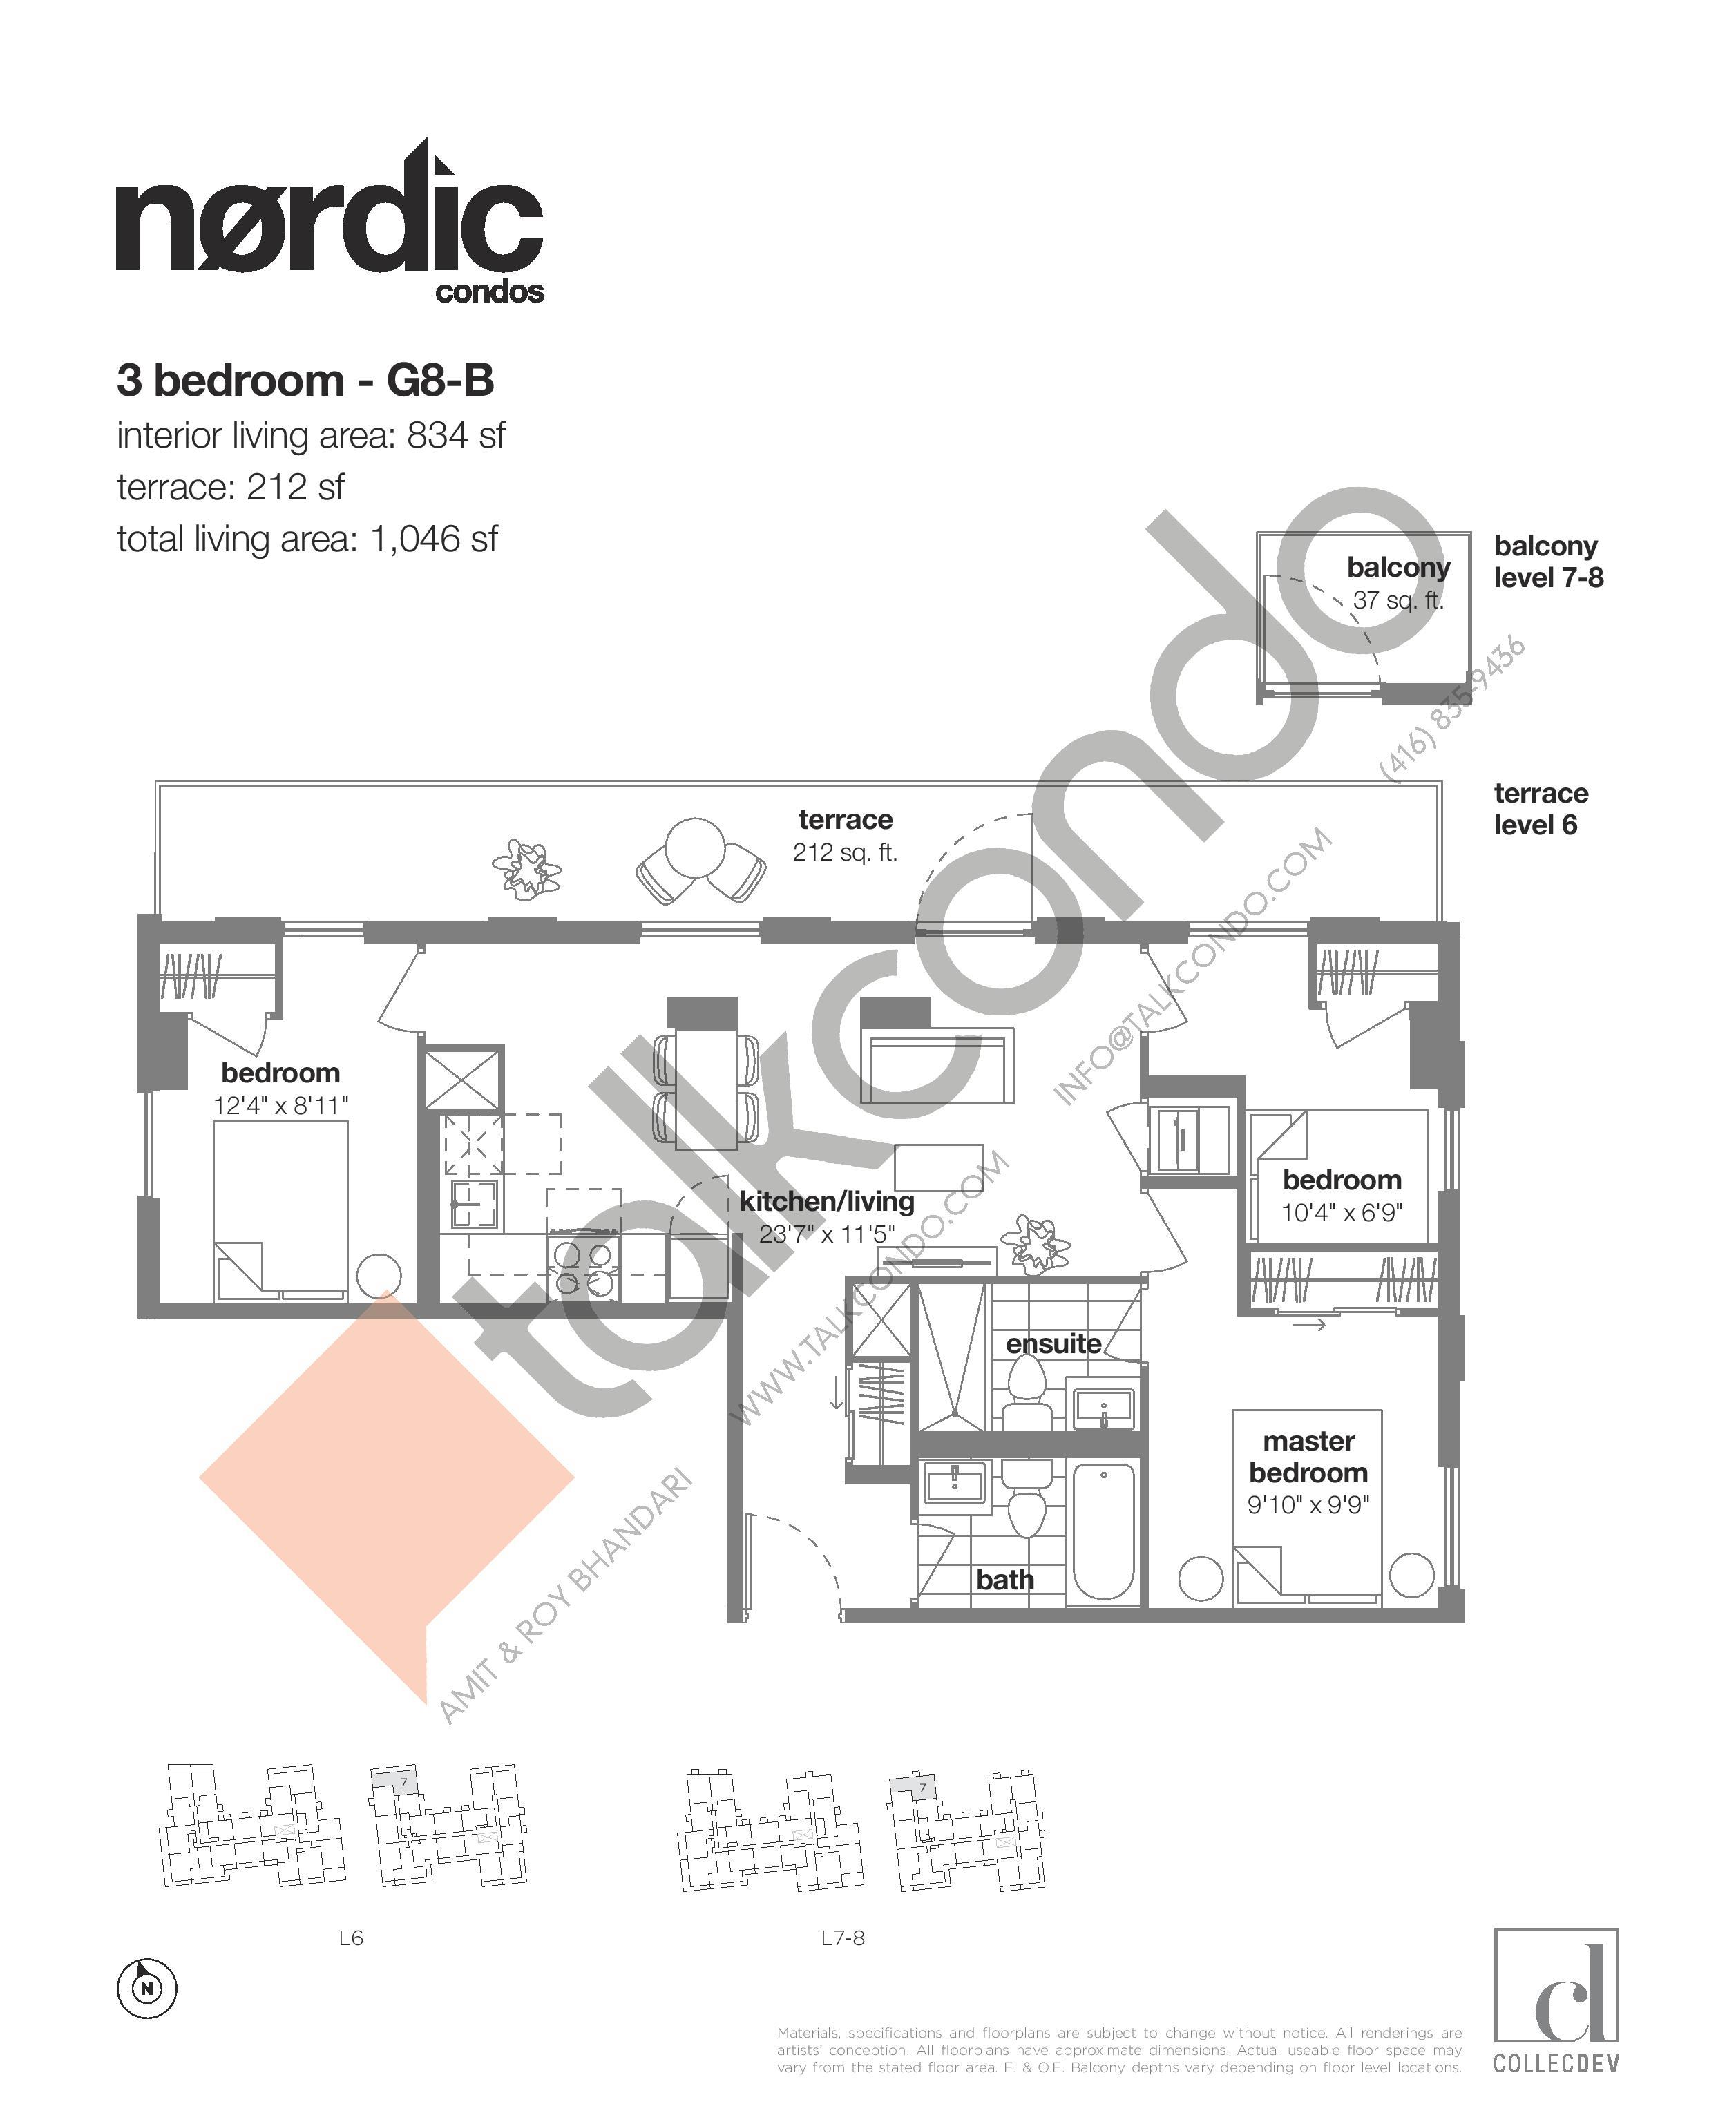 G8-B Floor Plan at Nordic Condos - 834 sq.ft